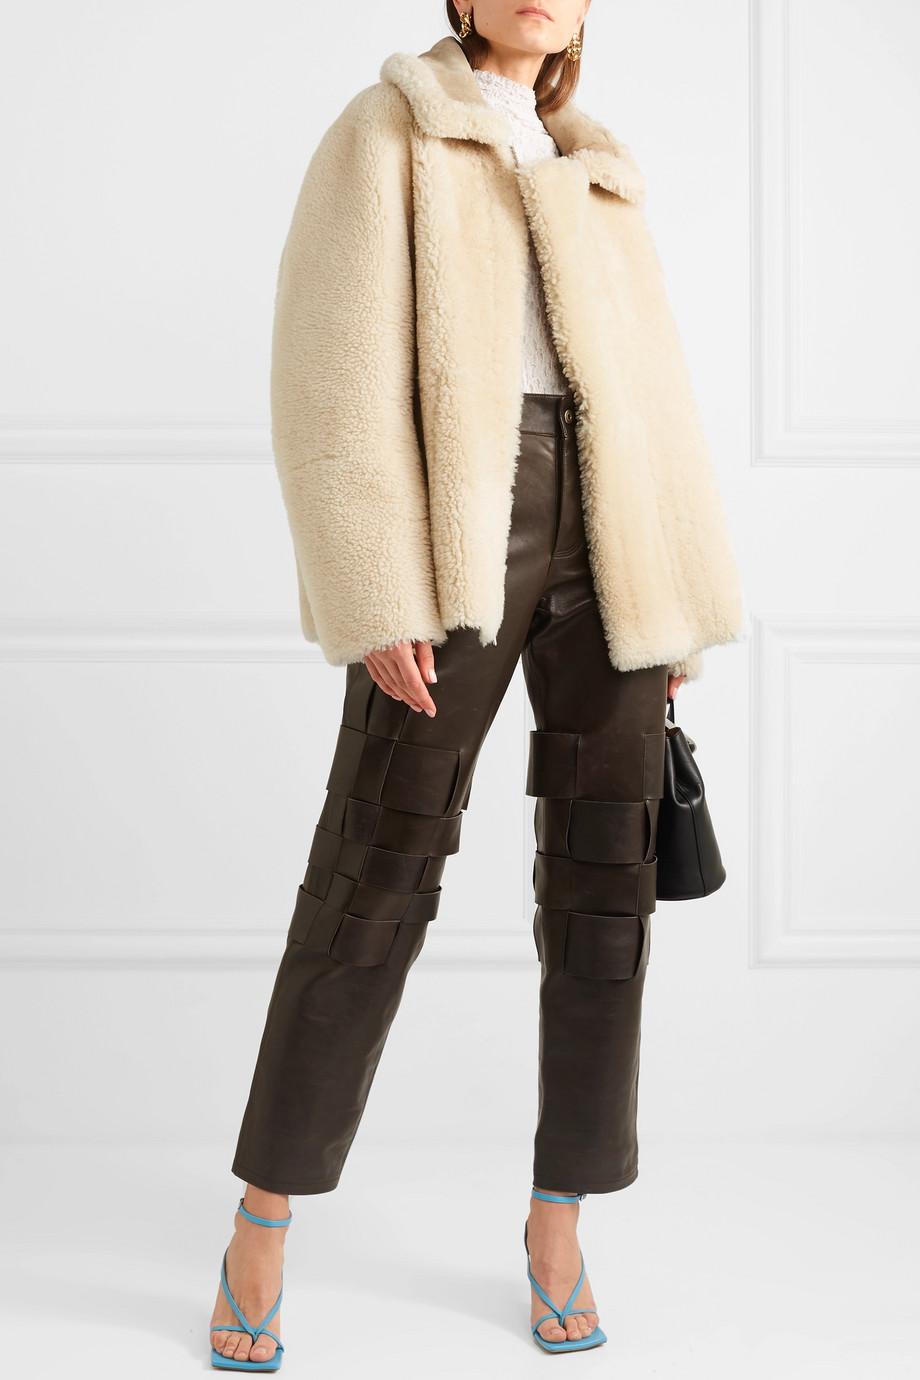 Bottega Veneta Shearling jacket